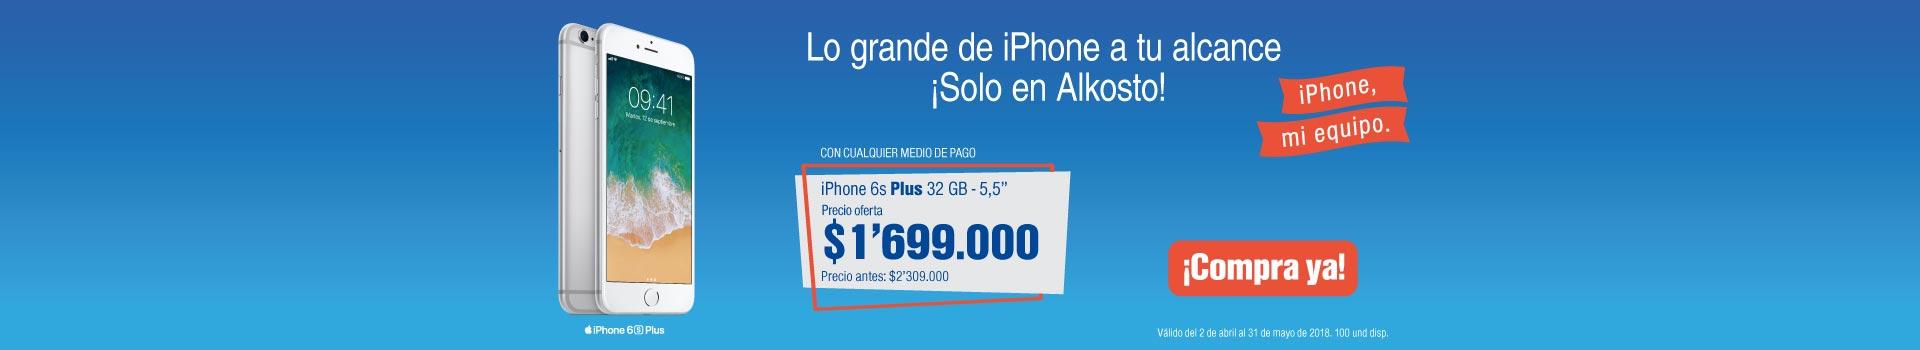 AK-BCAT-1-celulares-PP---Apple-6sPlus-May23